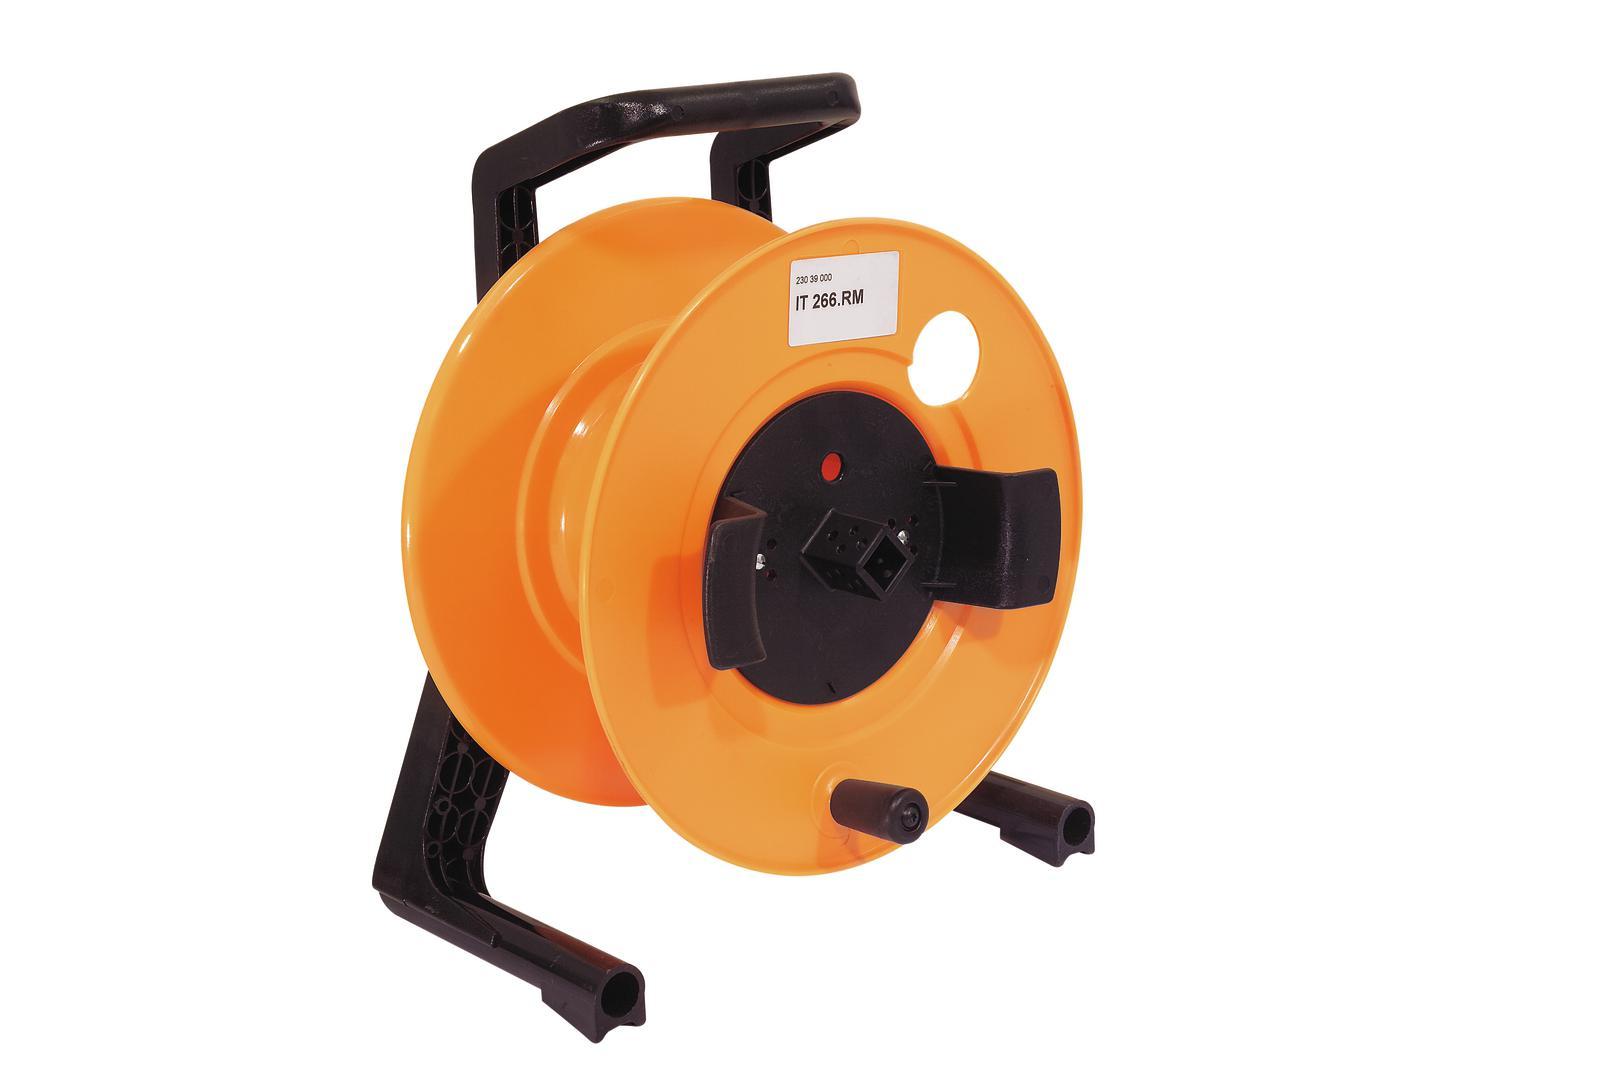 SCHILL tamburo IT266.RM=280/C=11